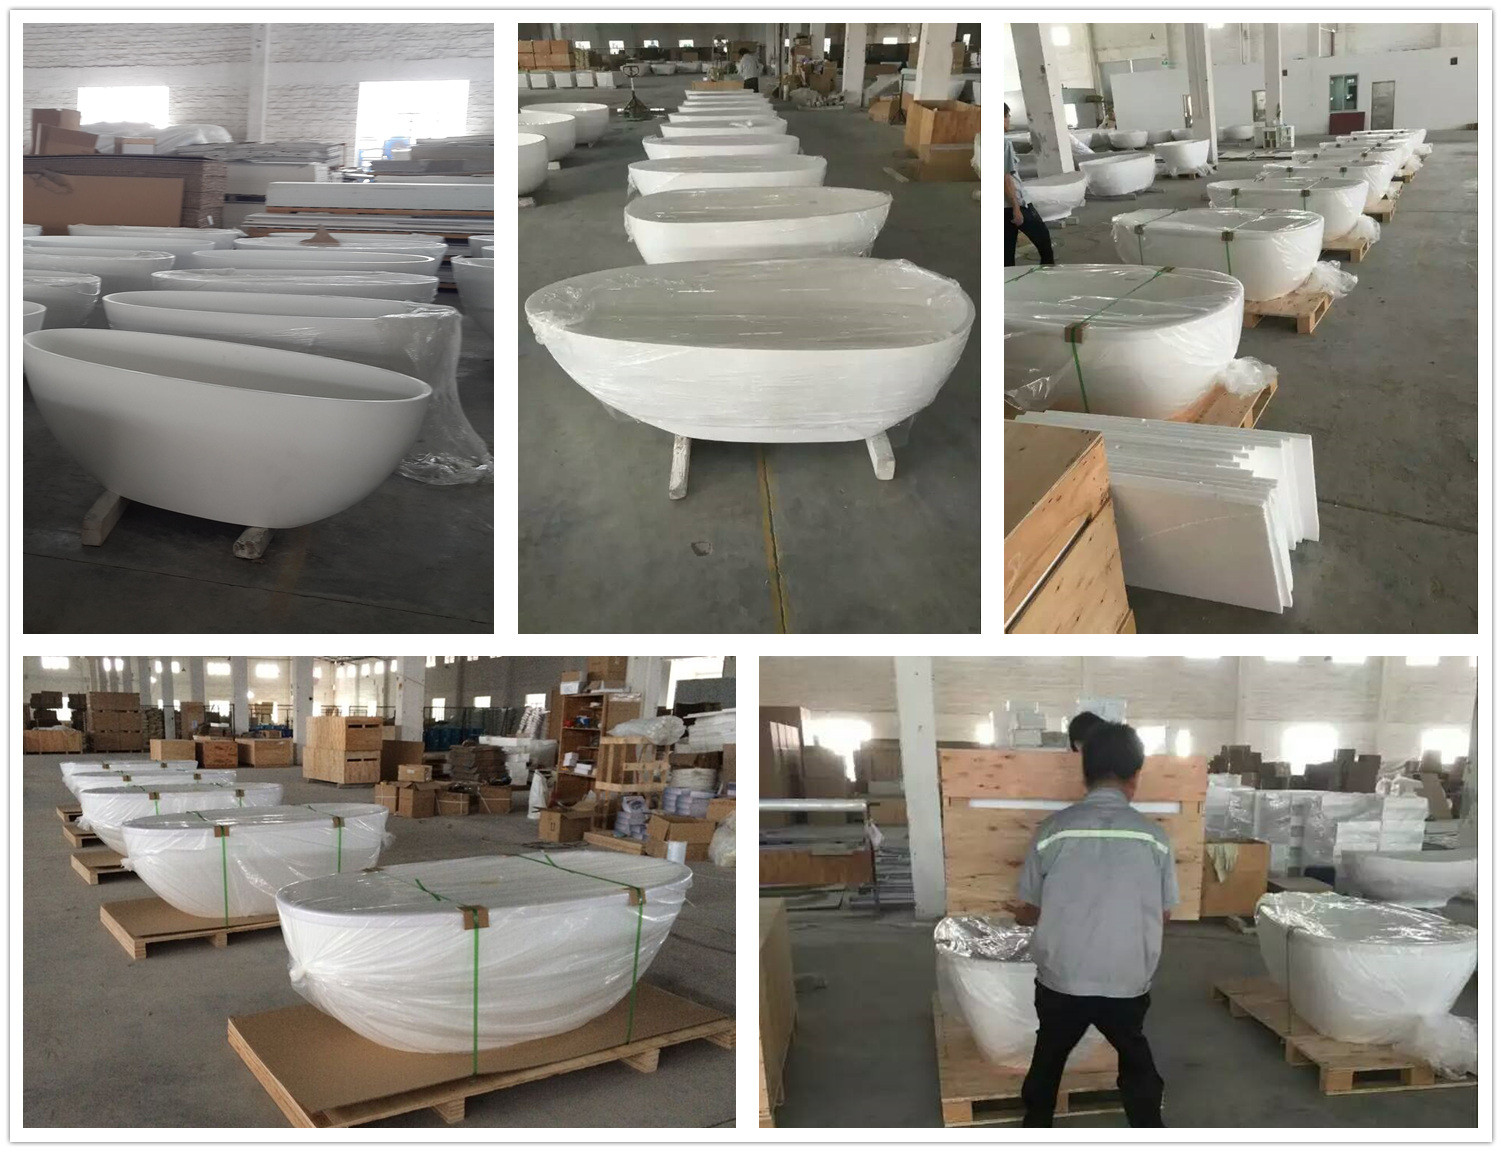 Bellissimo-Unique design solid surface bathroom cast resin freestanding sink-6